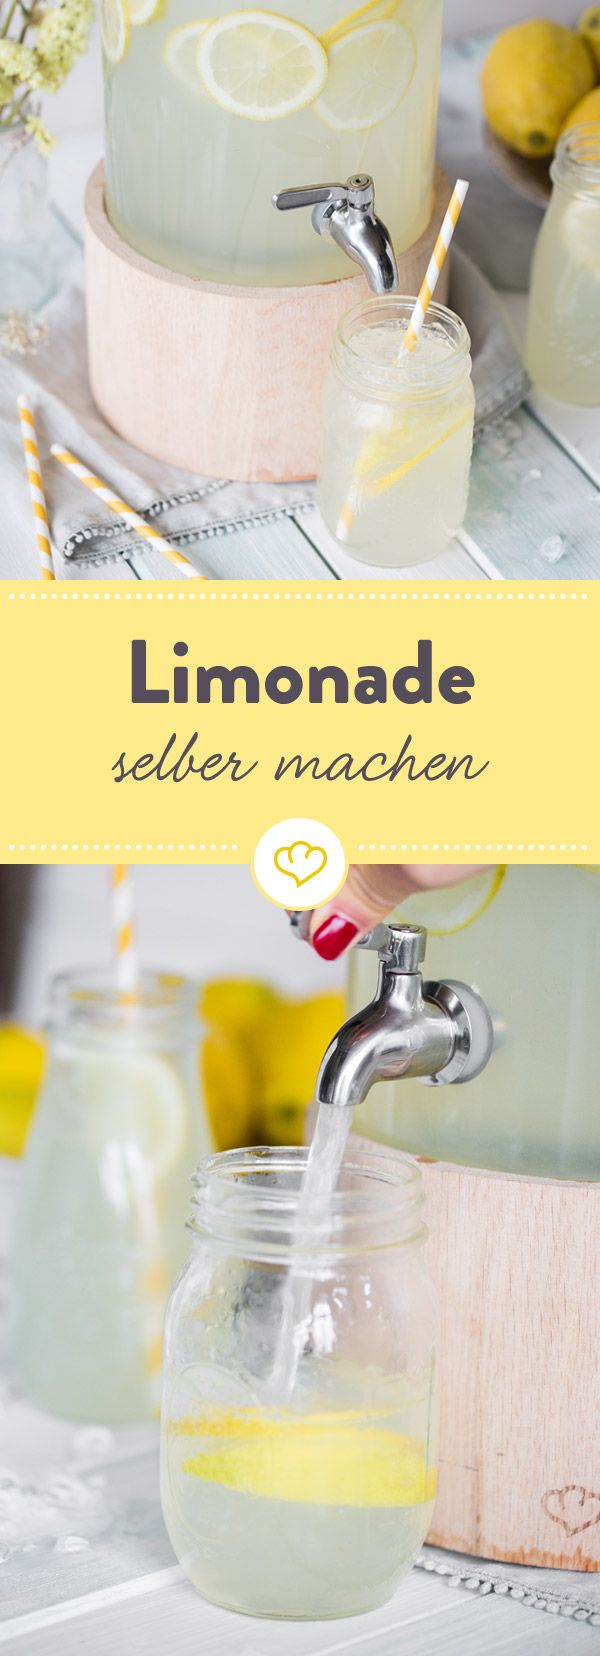 Zitronenlimonade selber machen - das Grundrezept